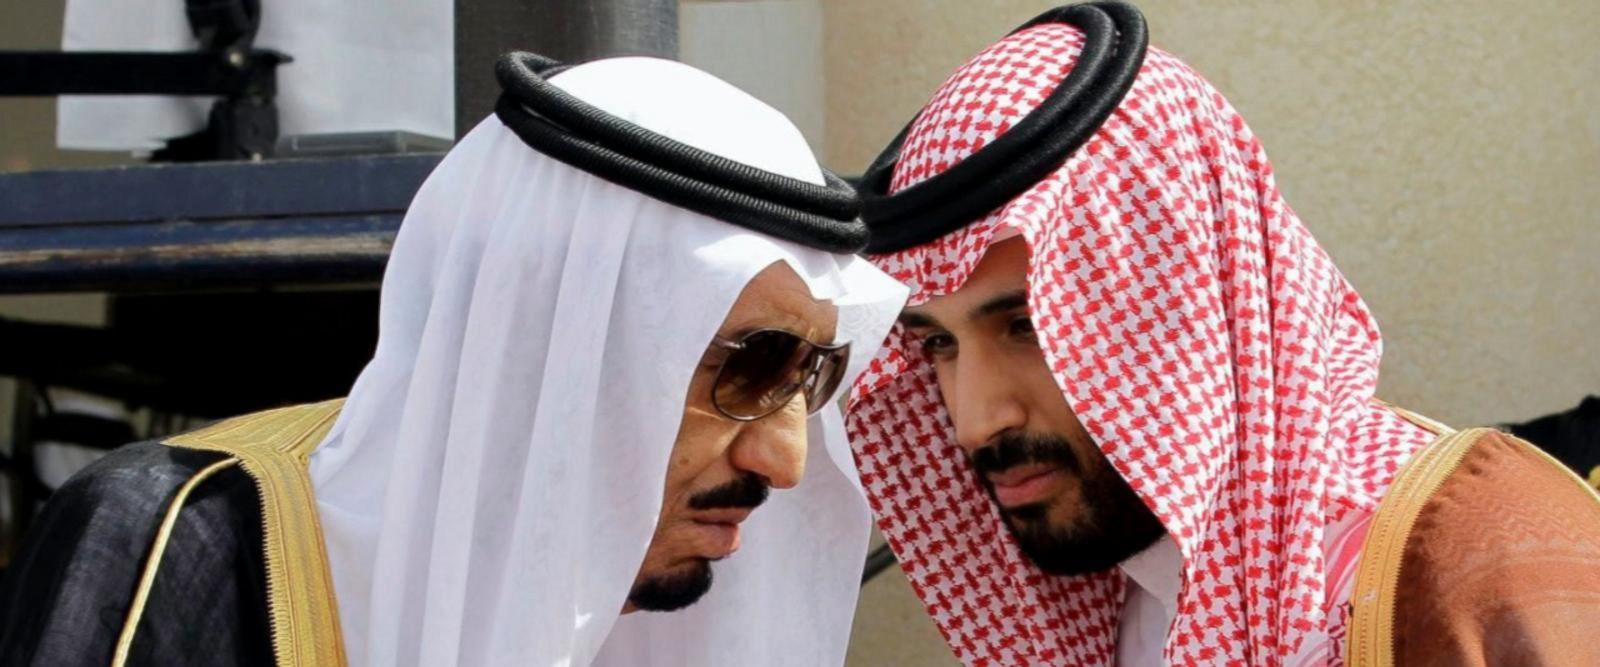 VIDEO: Saudi Arabia faces backlash for the death of Jamal Khashoggi